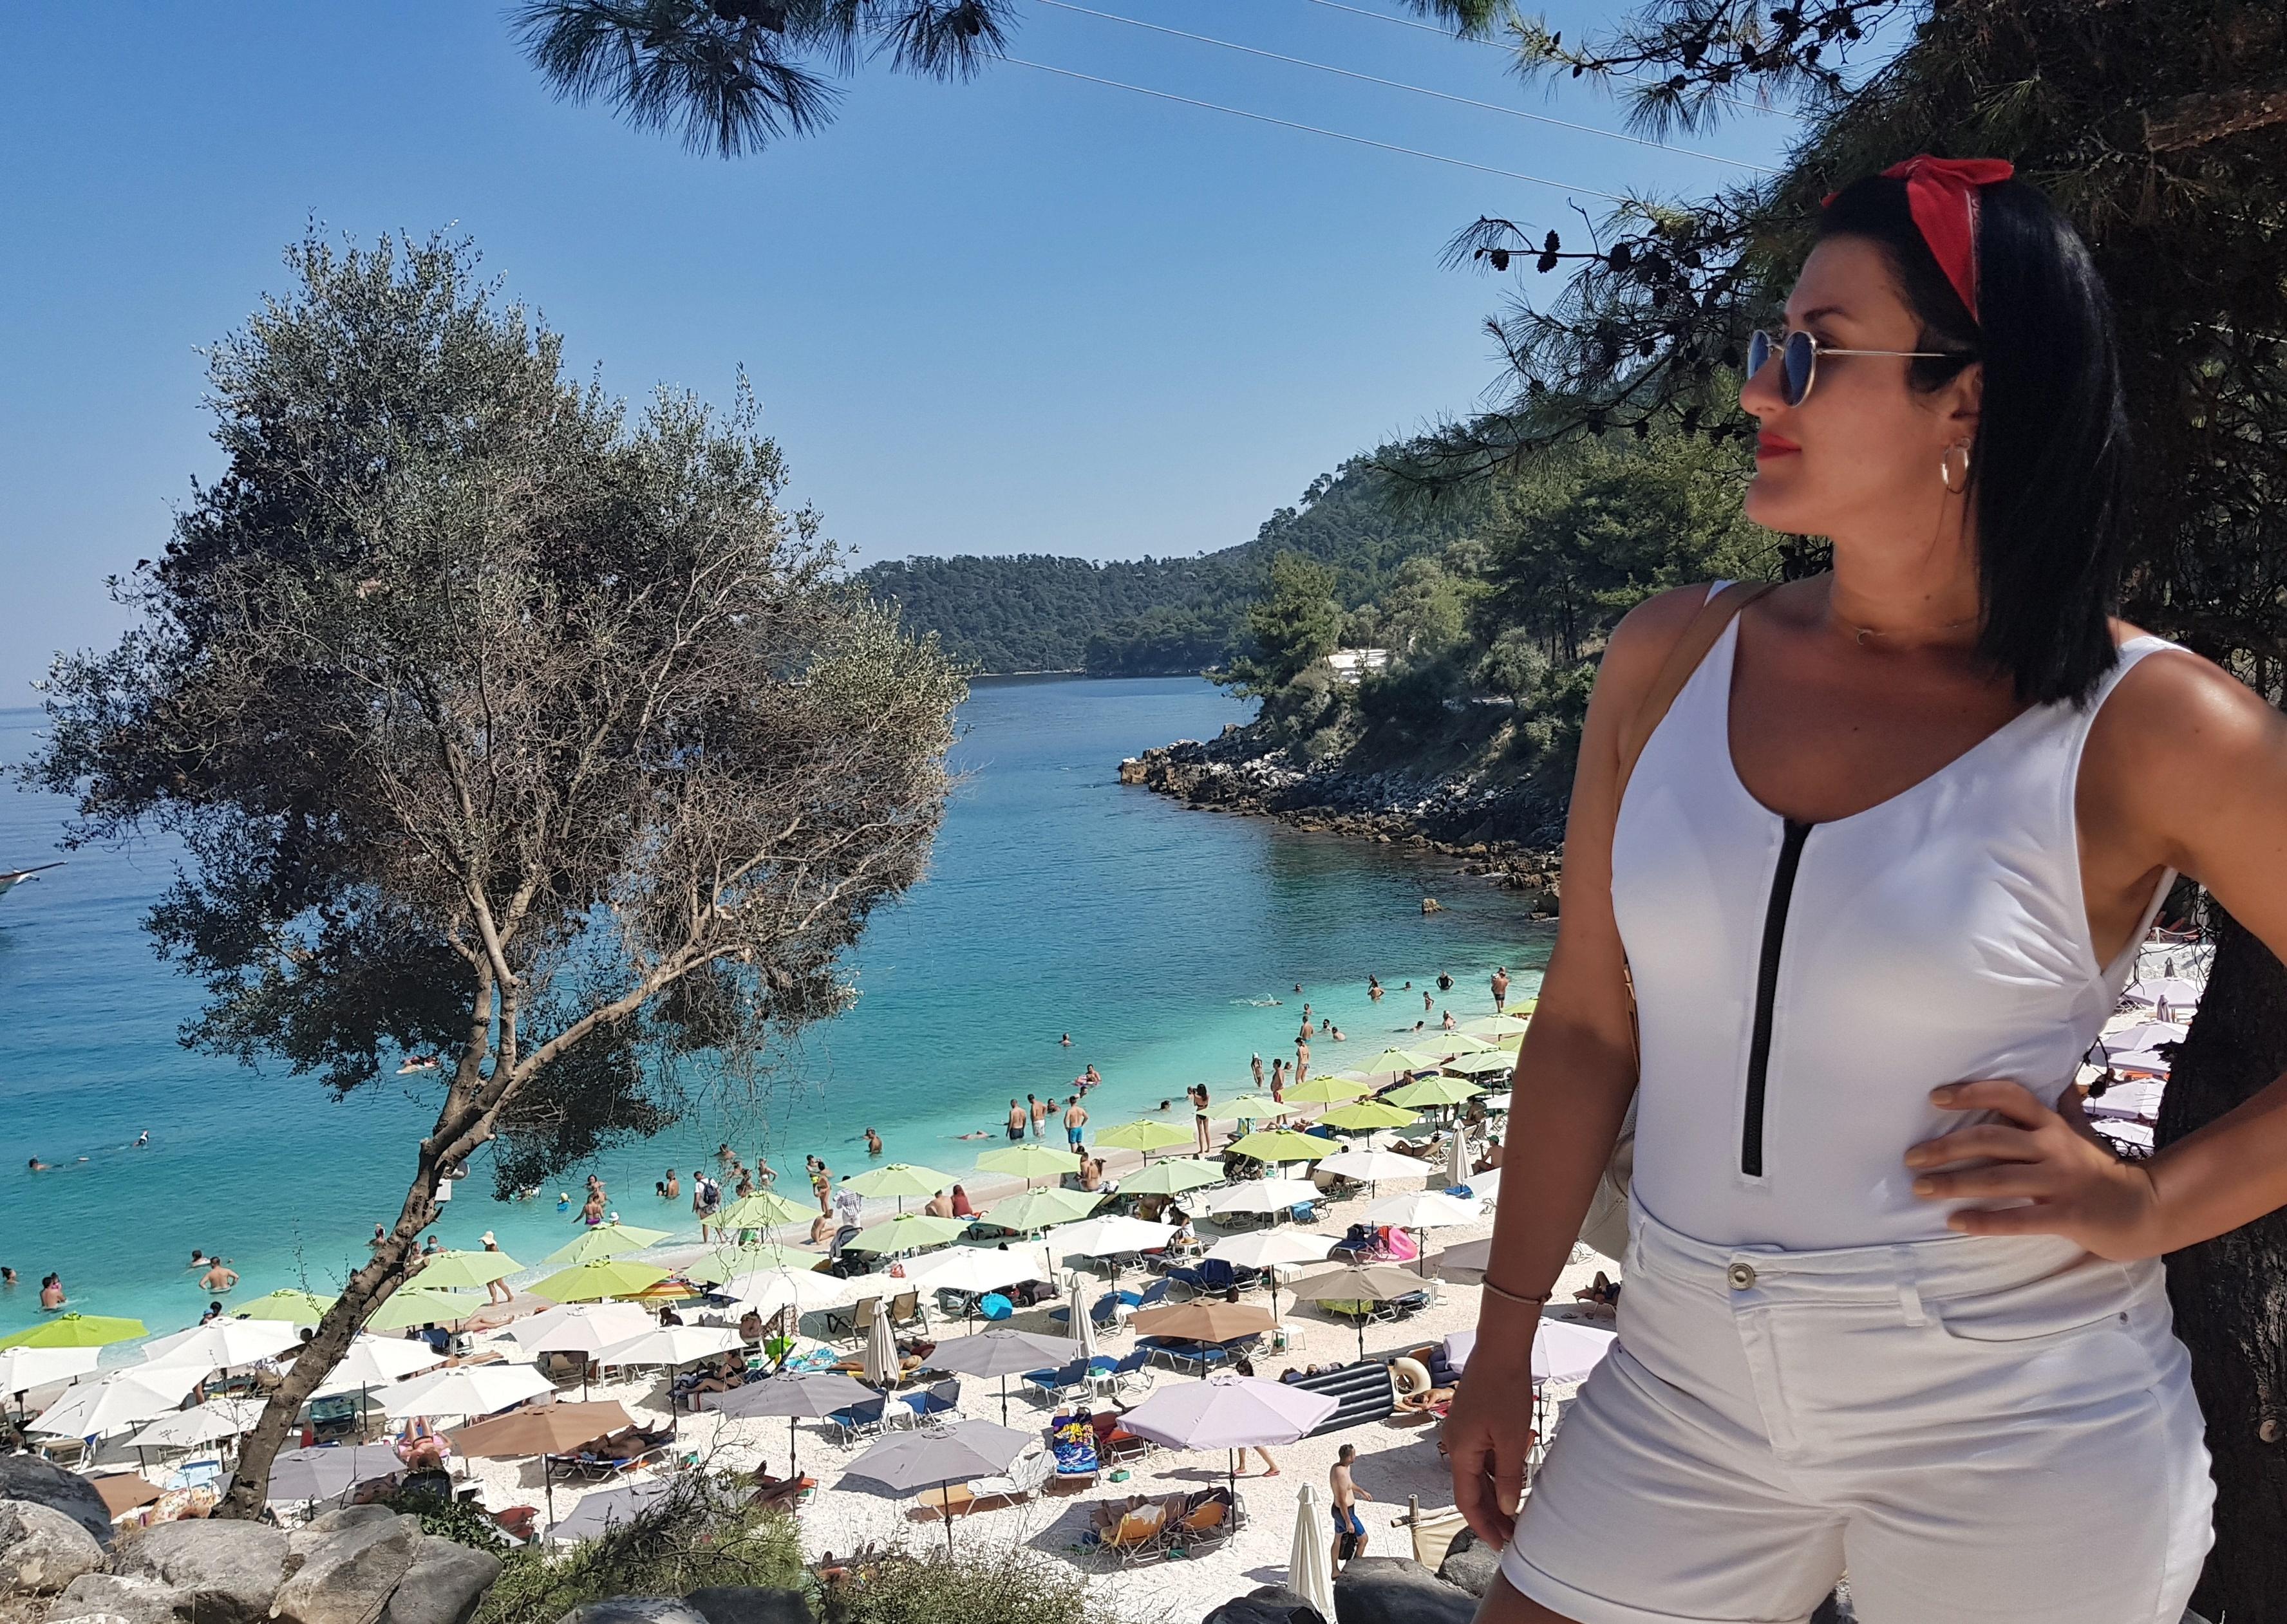 whiteswimsuit_zafulswimsiut_Marble_beach